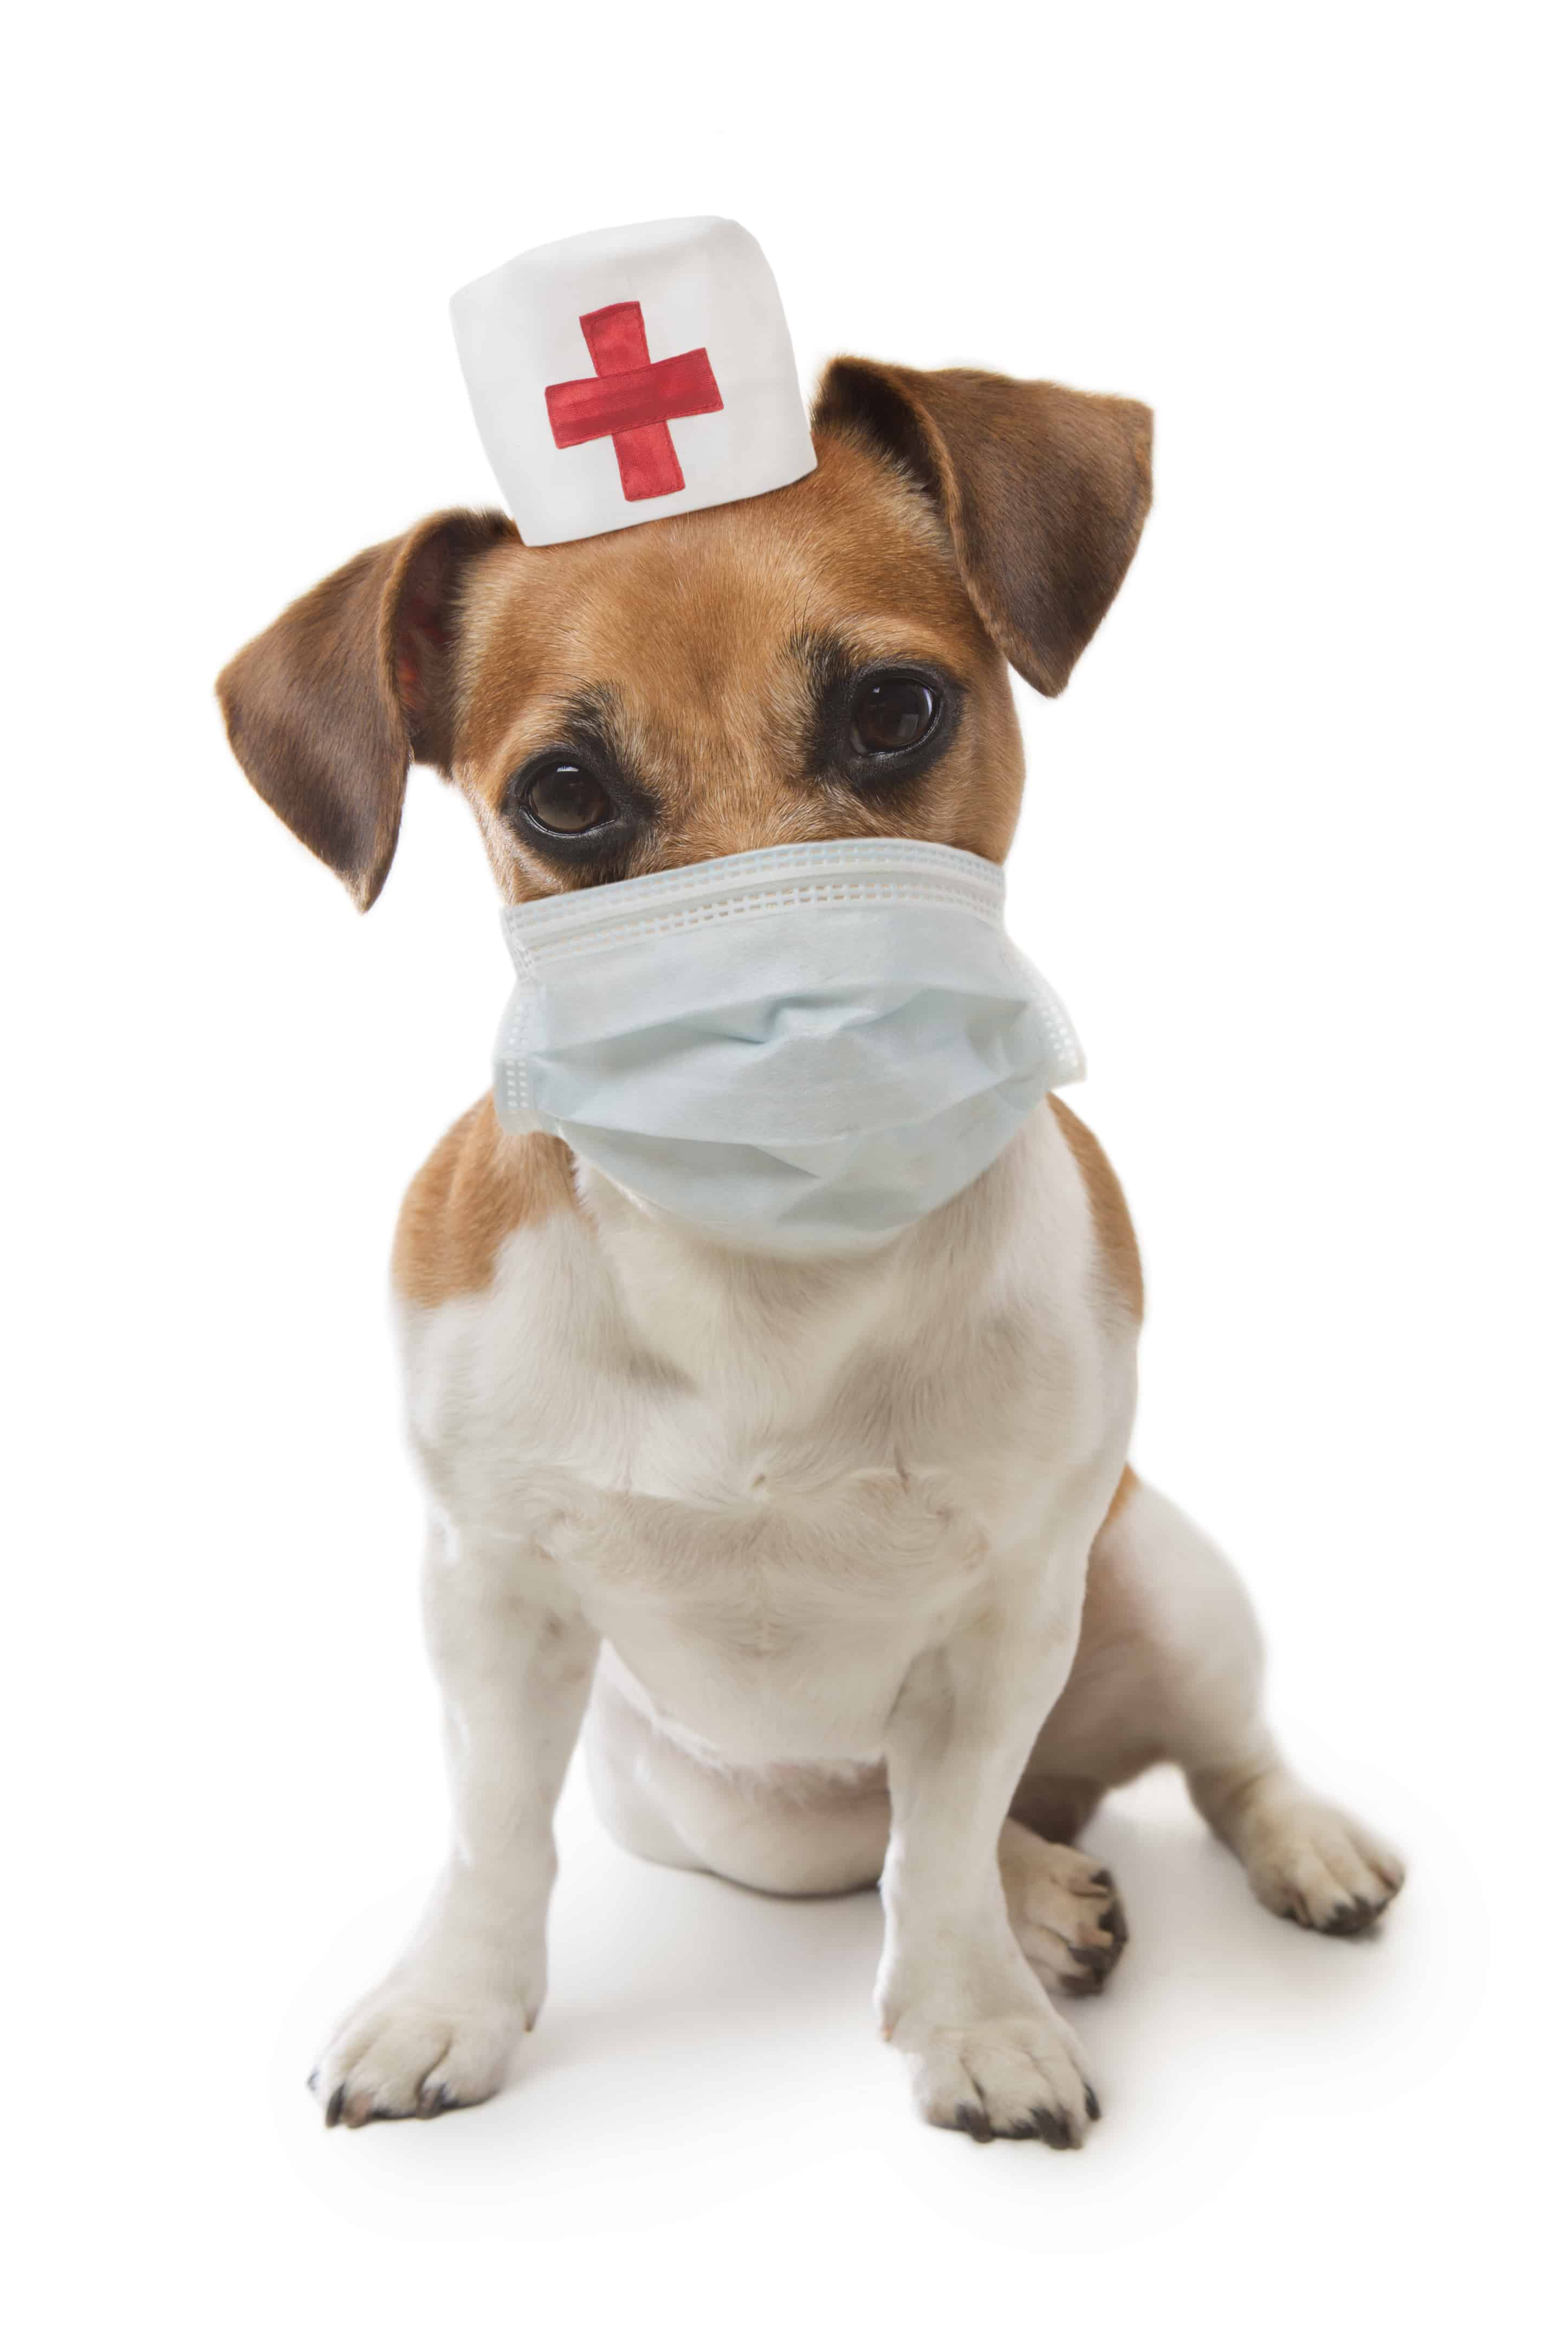 checking nurse dog